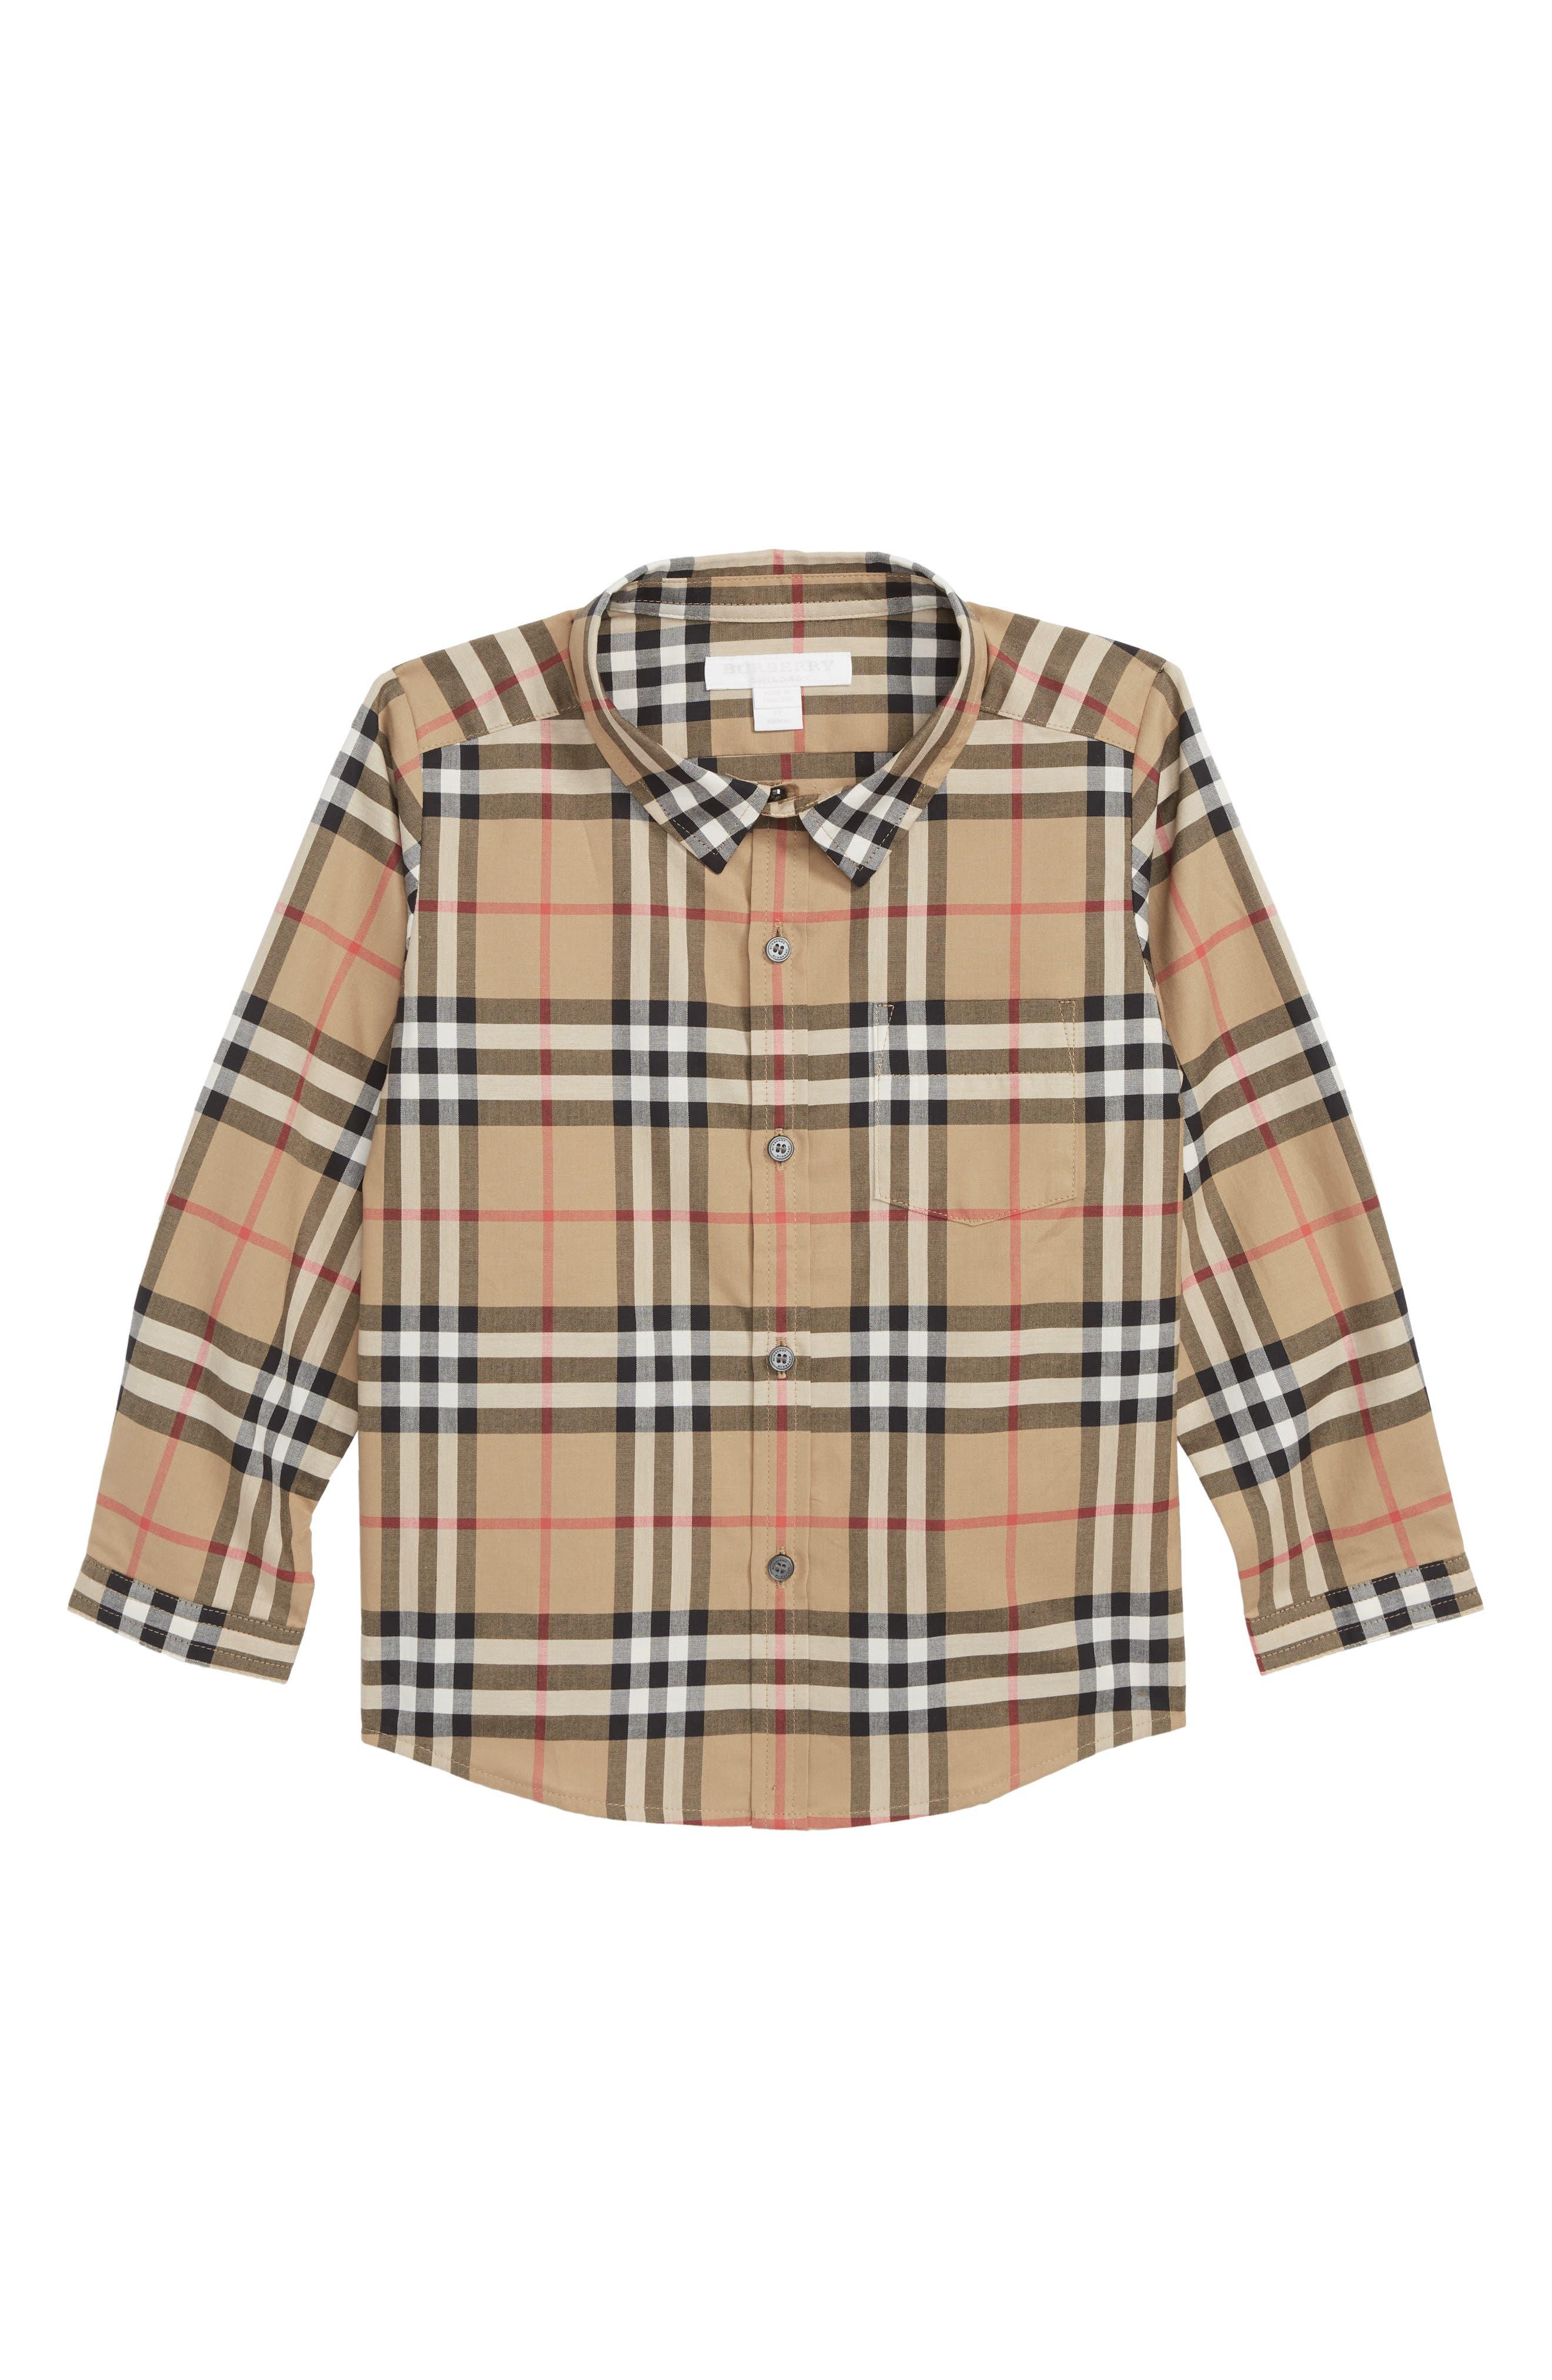 Fred Check Shirt,                             Main thumbnail 1, color,                             ANTIQUE YELLOW